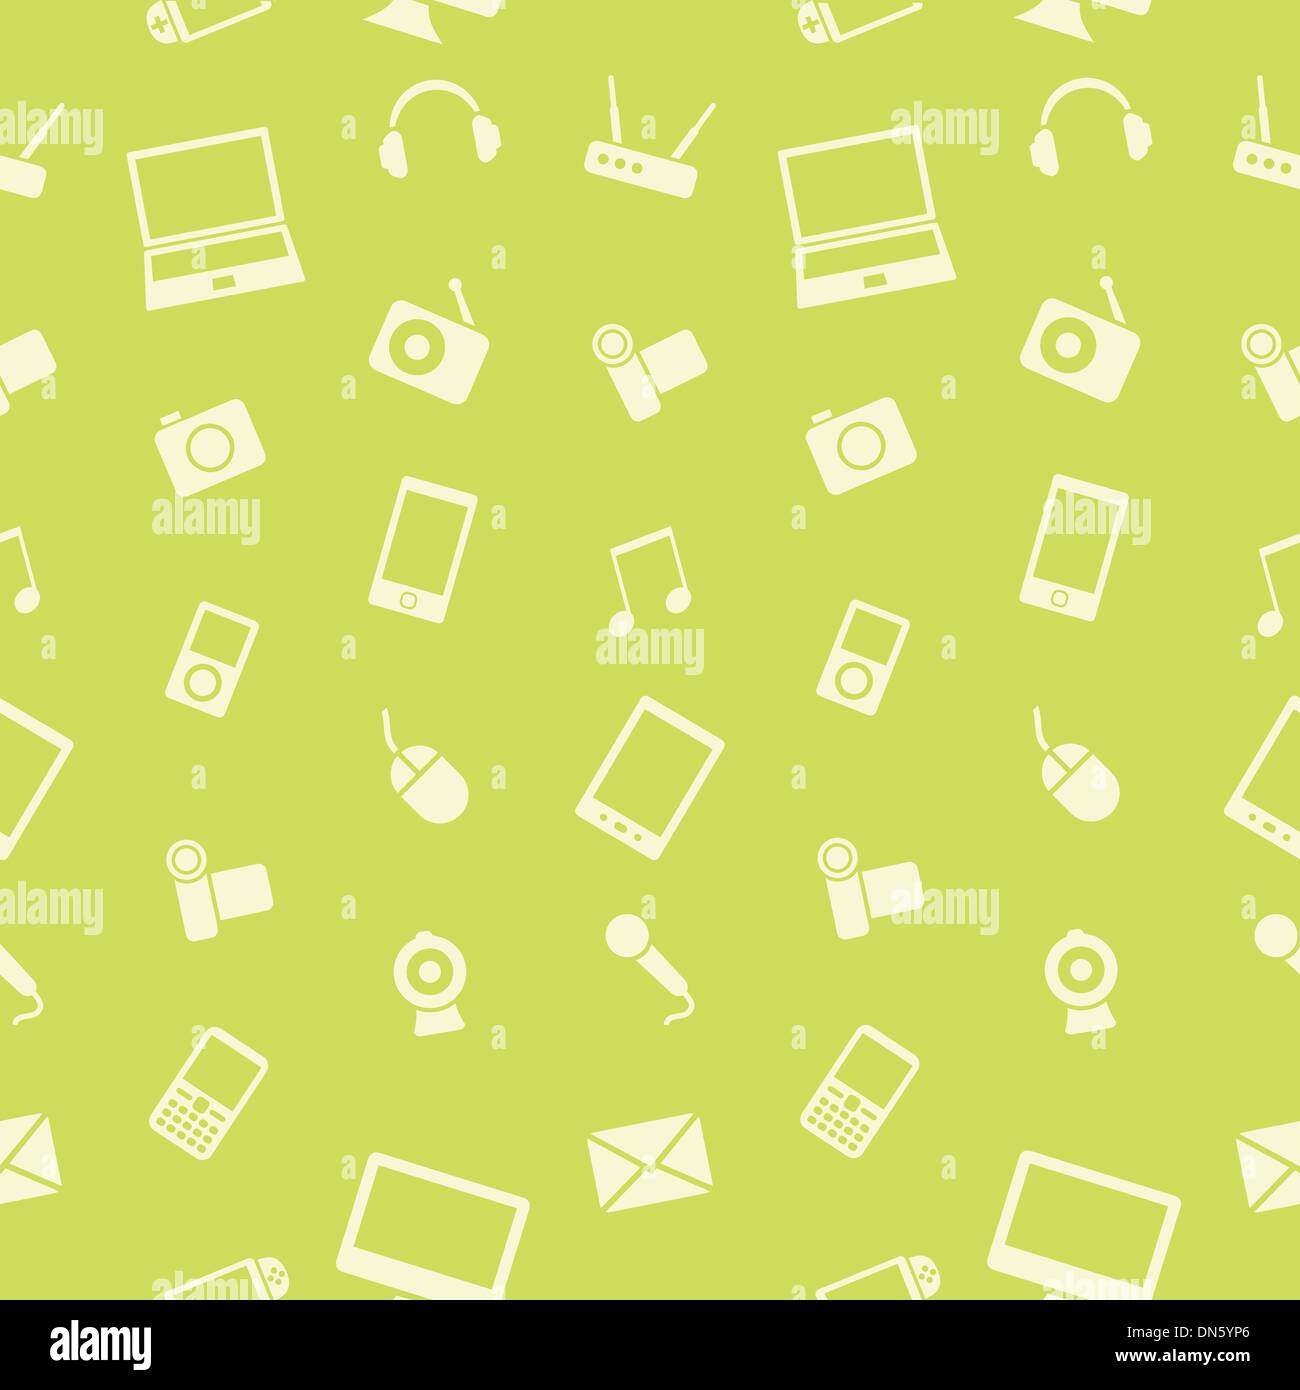 Vector electronics gadget seamless pattern. - Stock Image